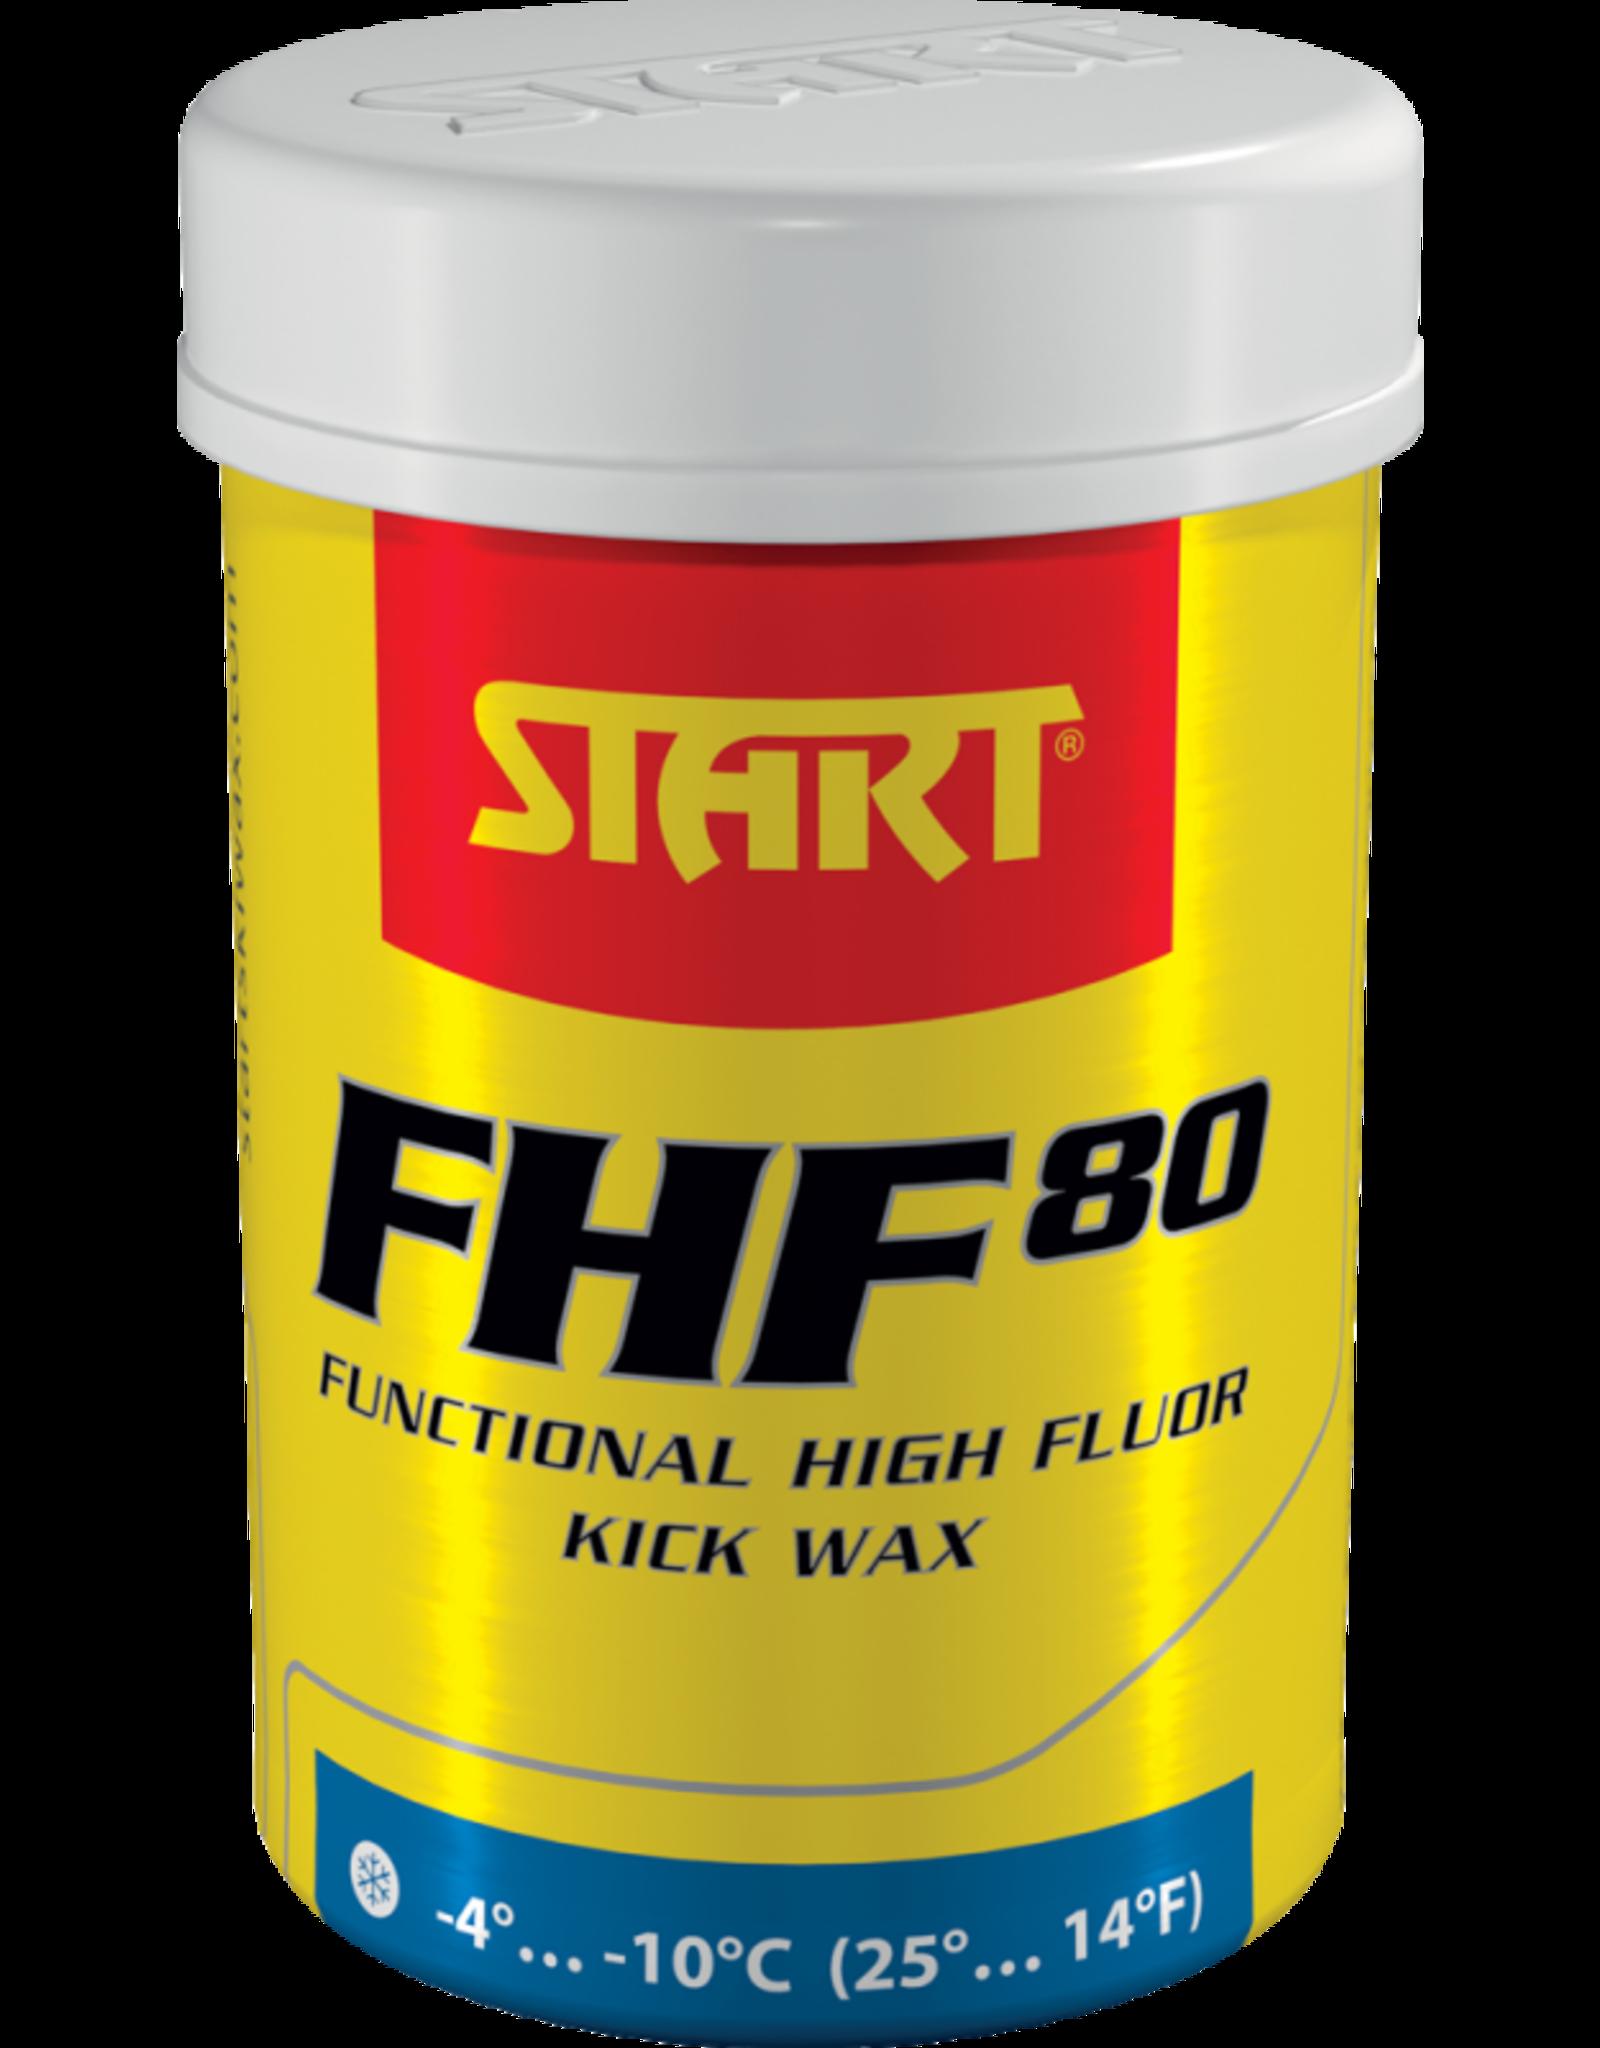 Start Start Kick FHF80 Fluor